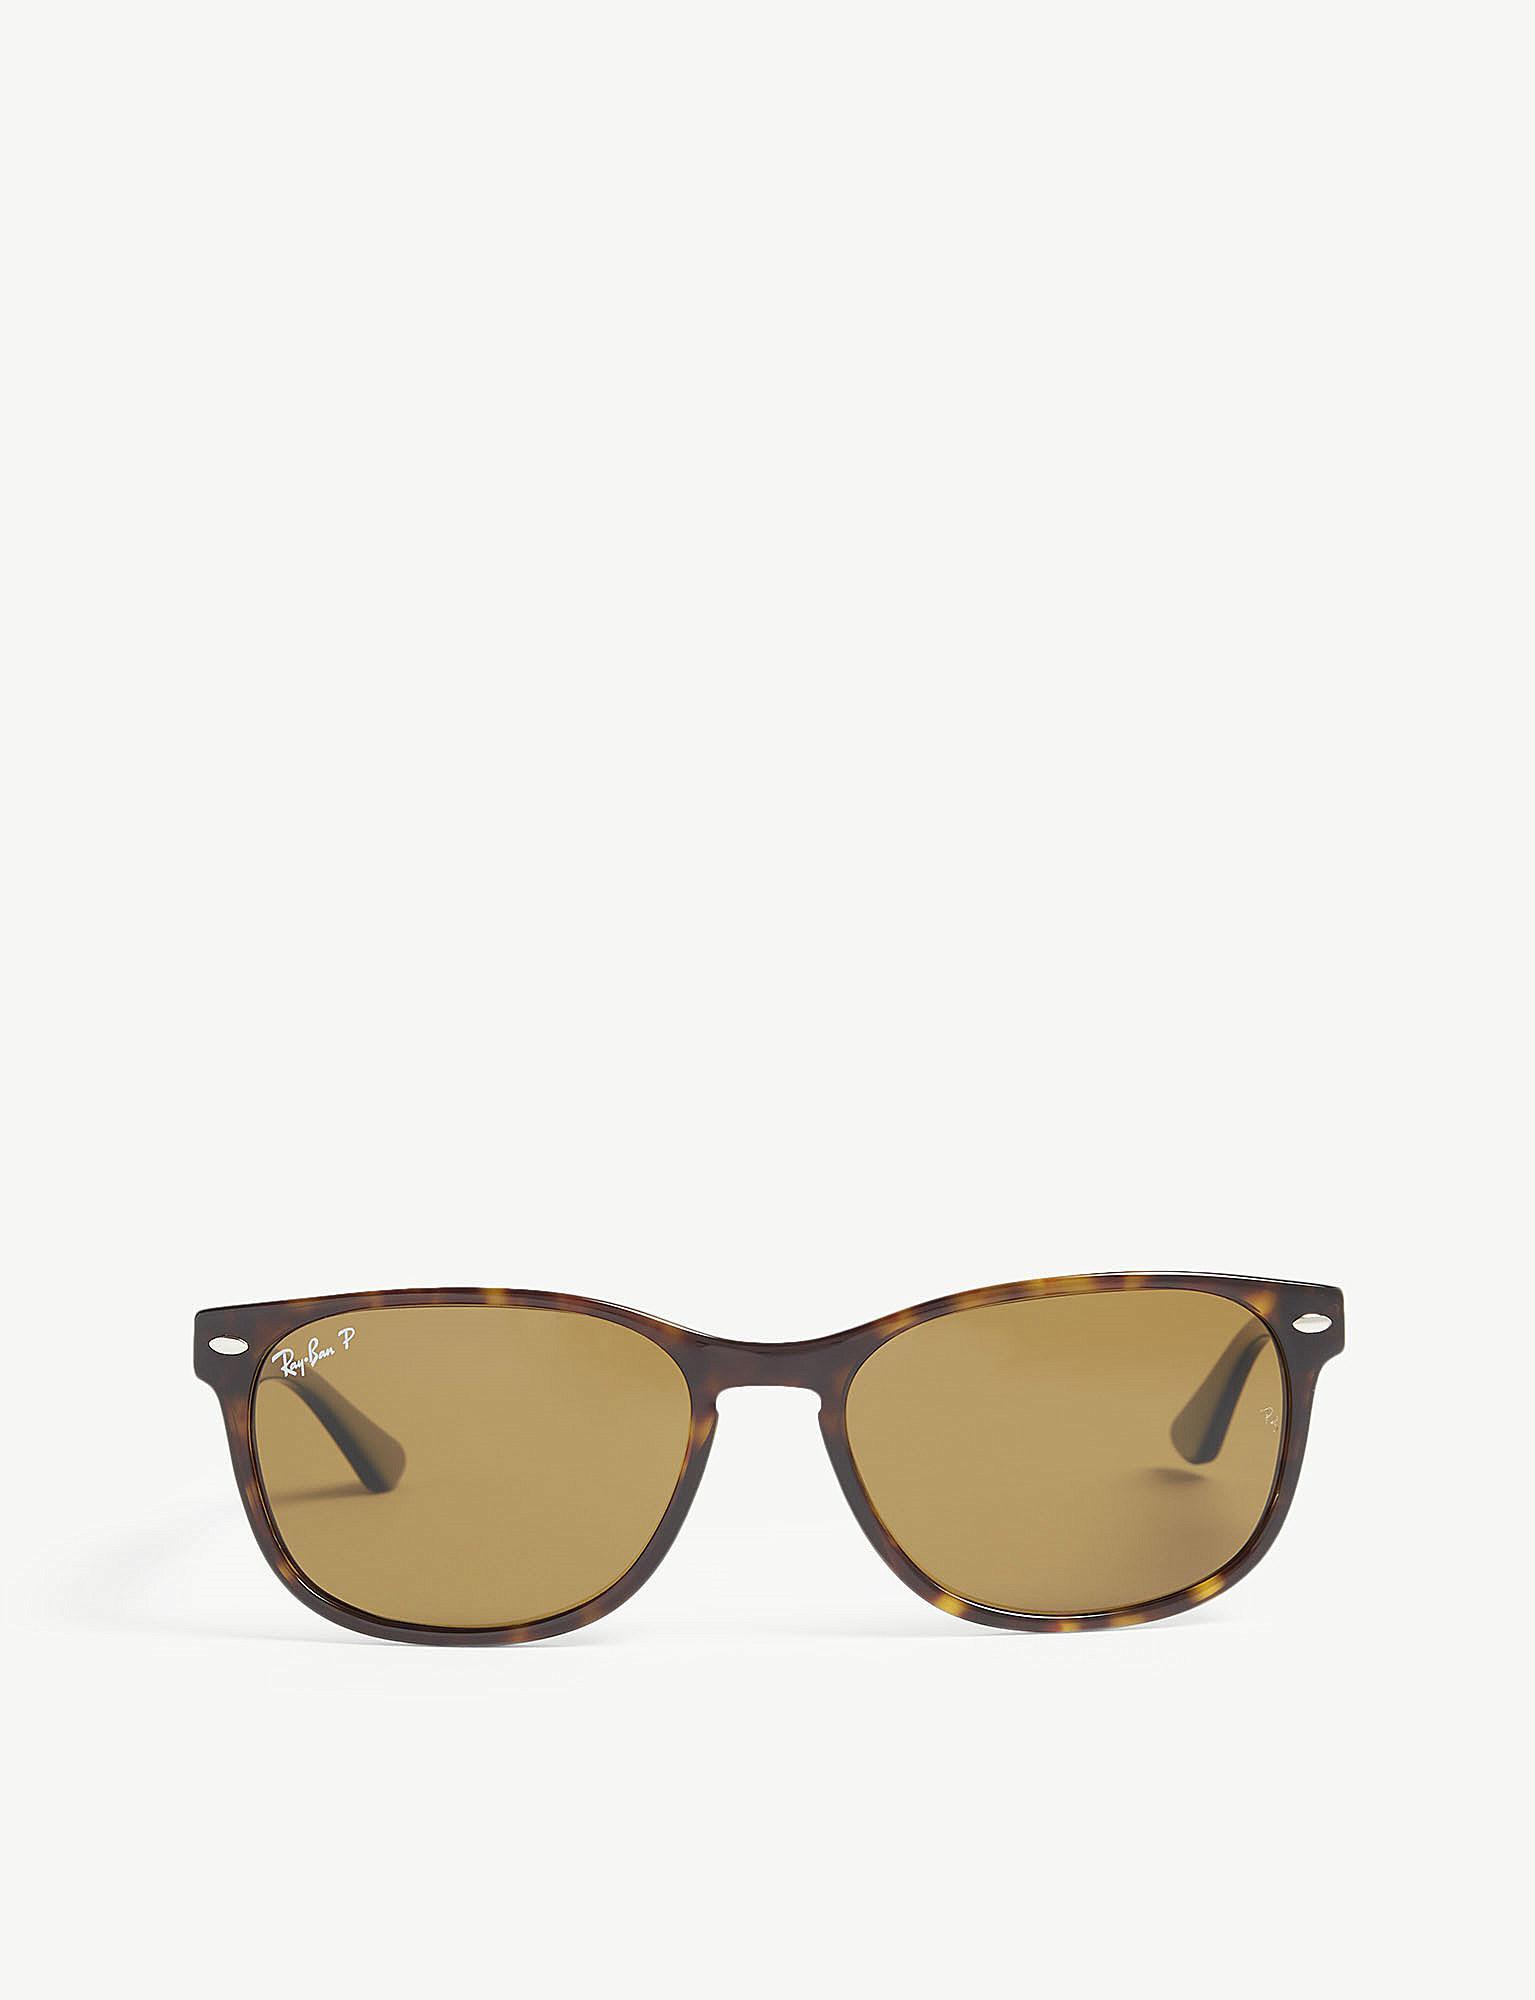 6de94f9848 Ray-Ban. Women s Rb2184 Rectangle-frame Havana Sunglasses